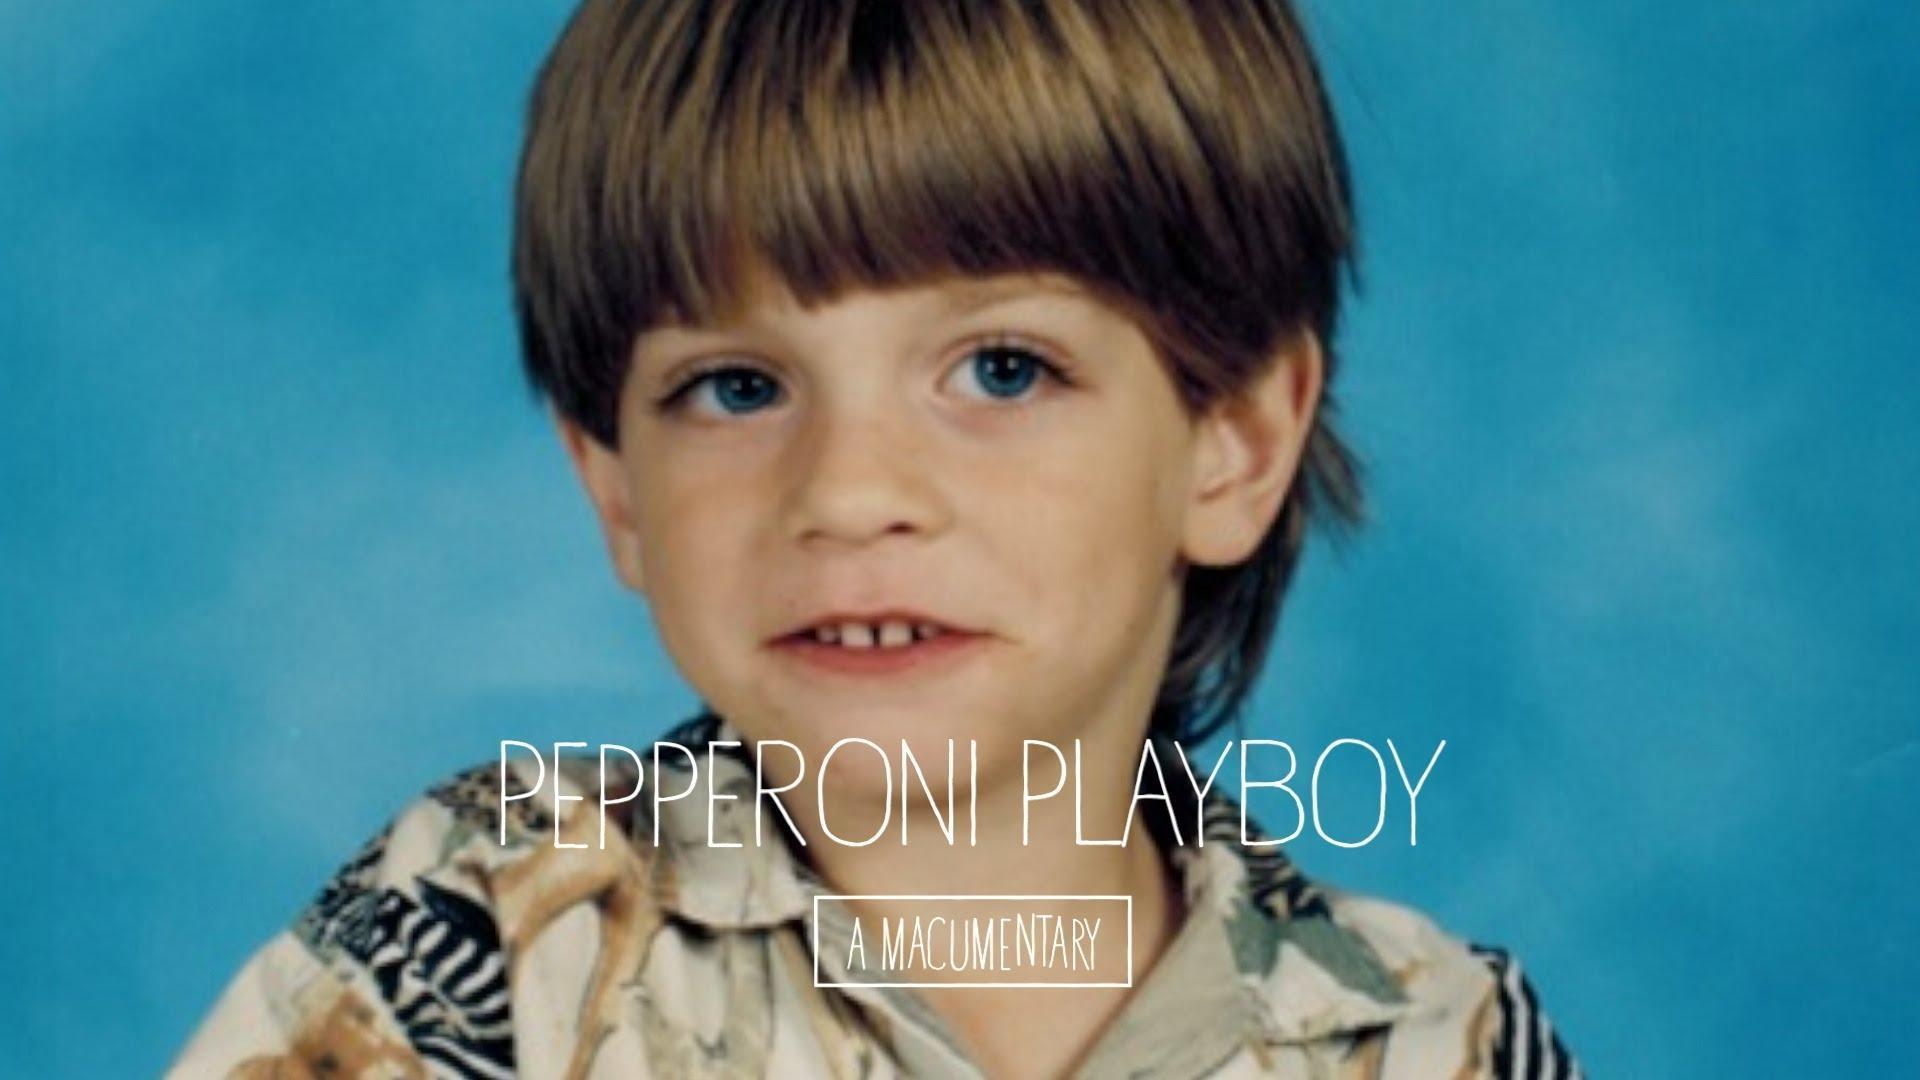 /Users/garrettshadwick/Desktop/Music documetaries/pepperoni playboy.jpg